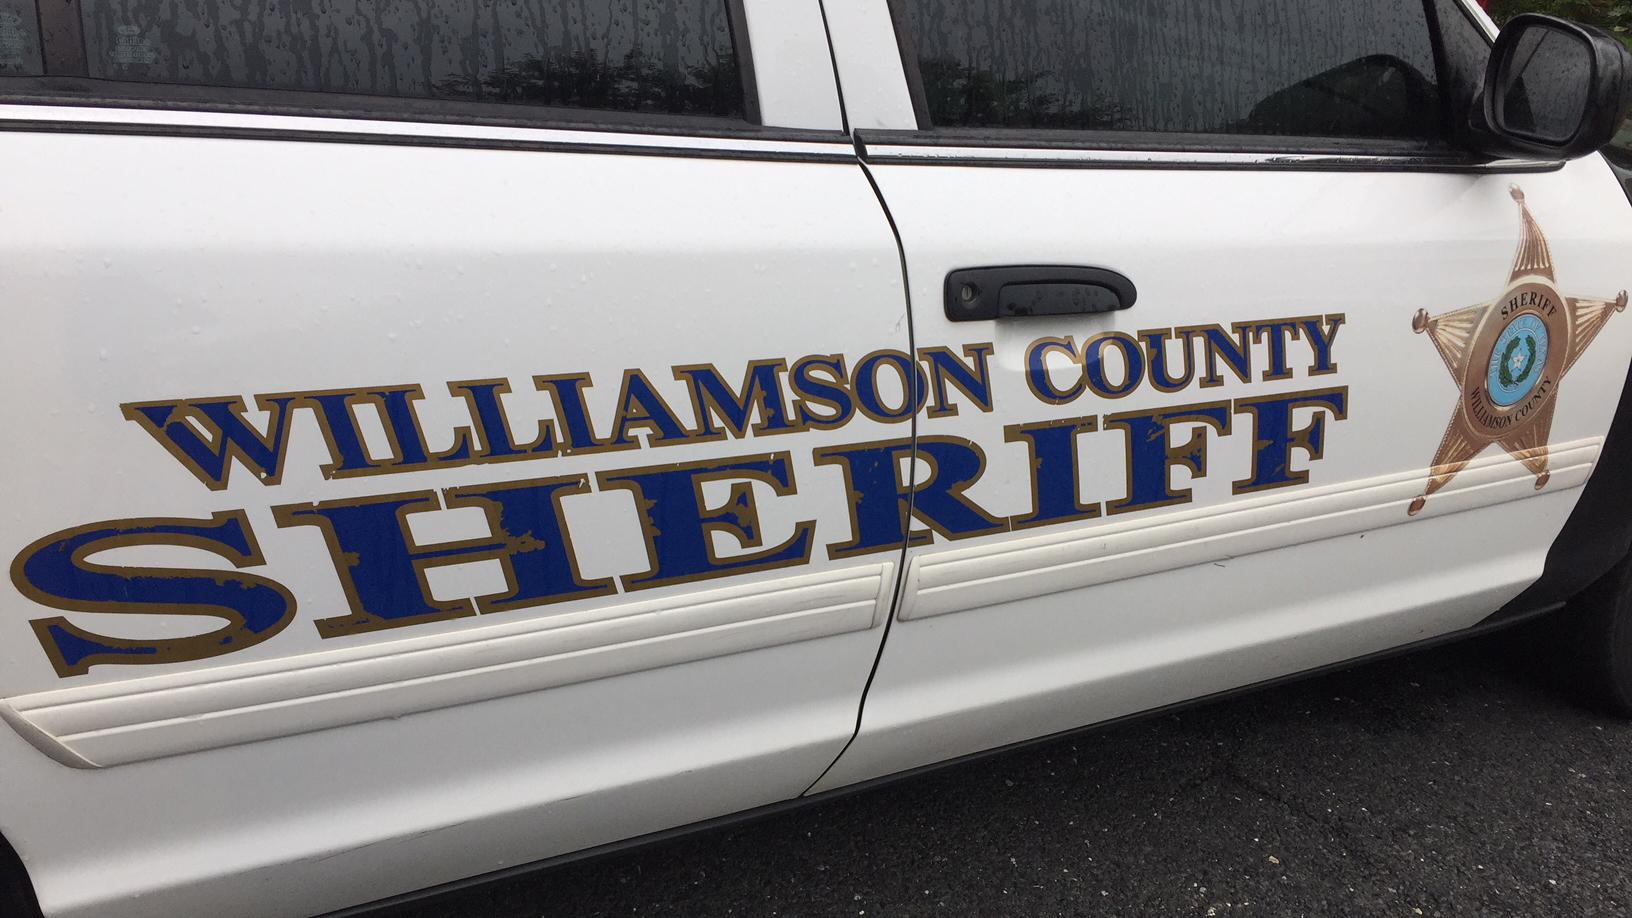 williamson county sheriff_1531160999535.jpg.jpg